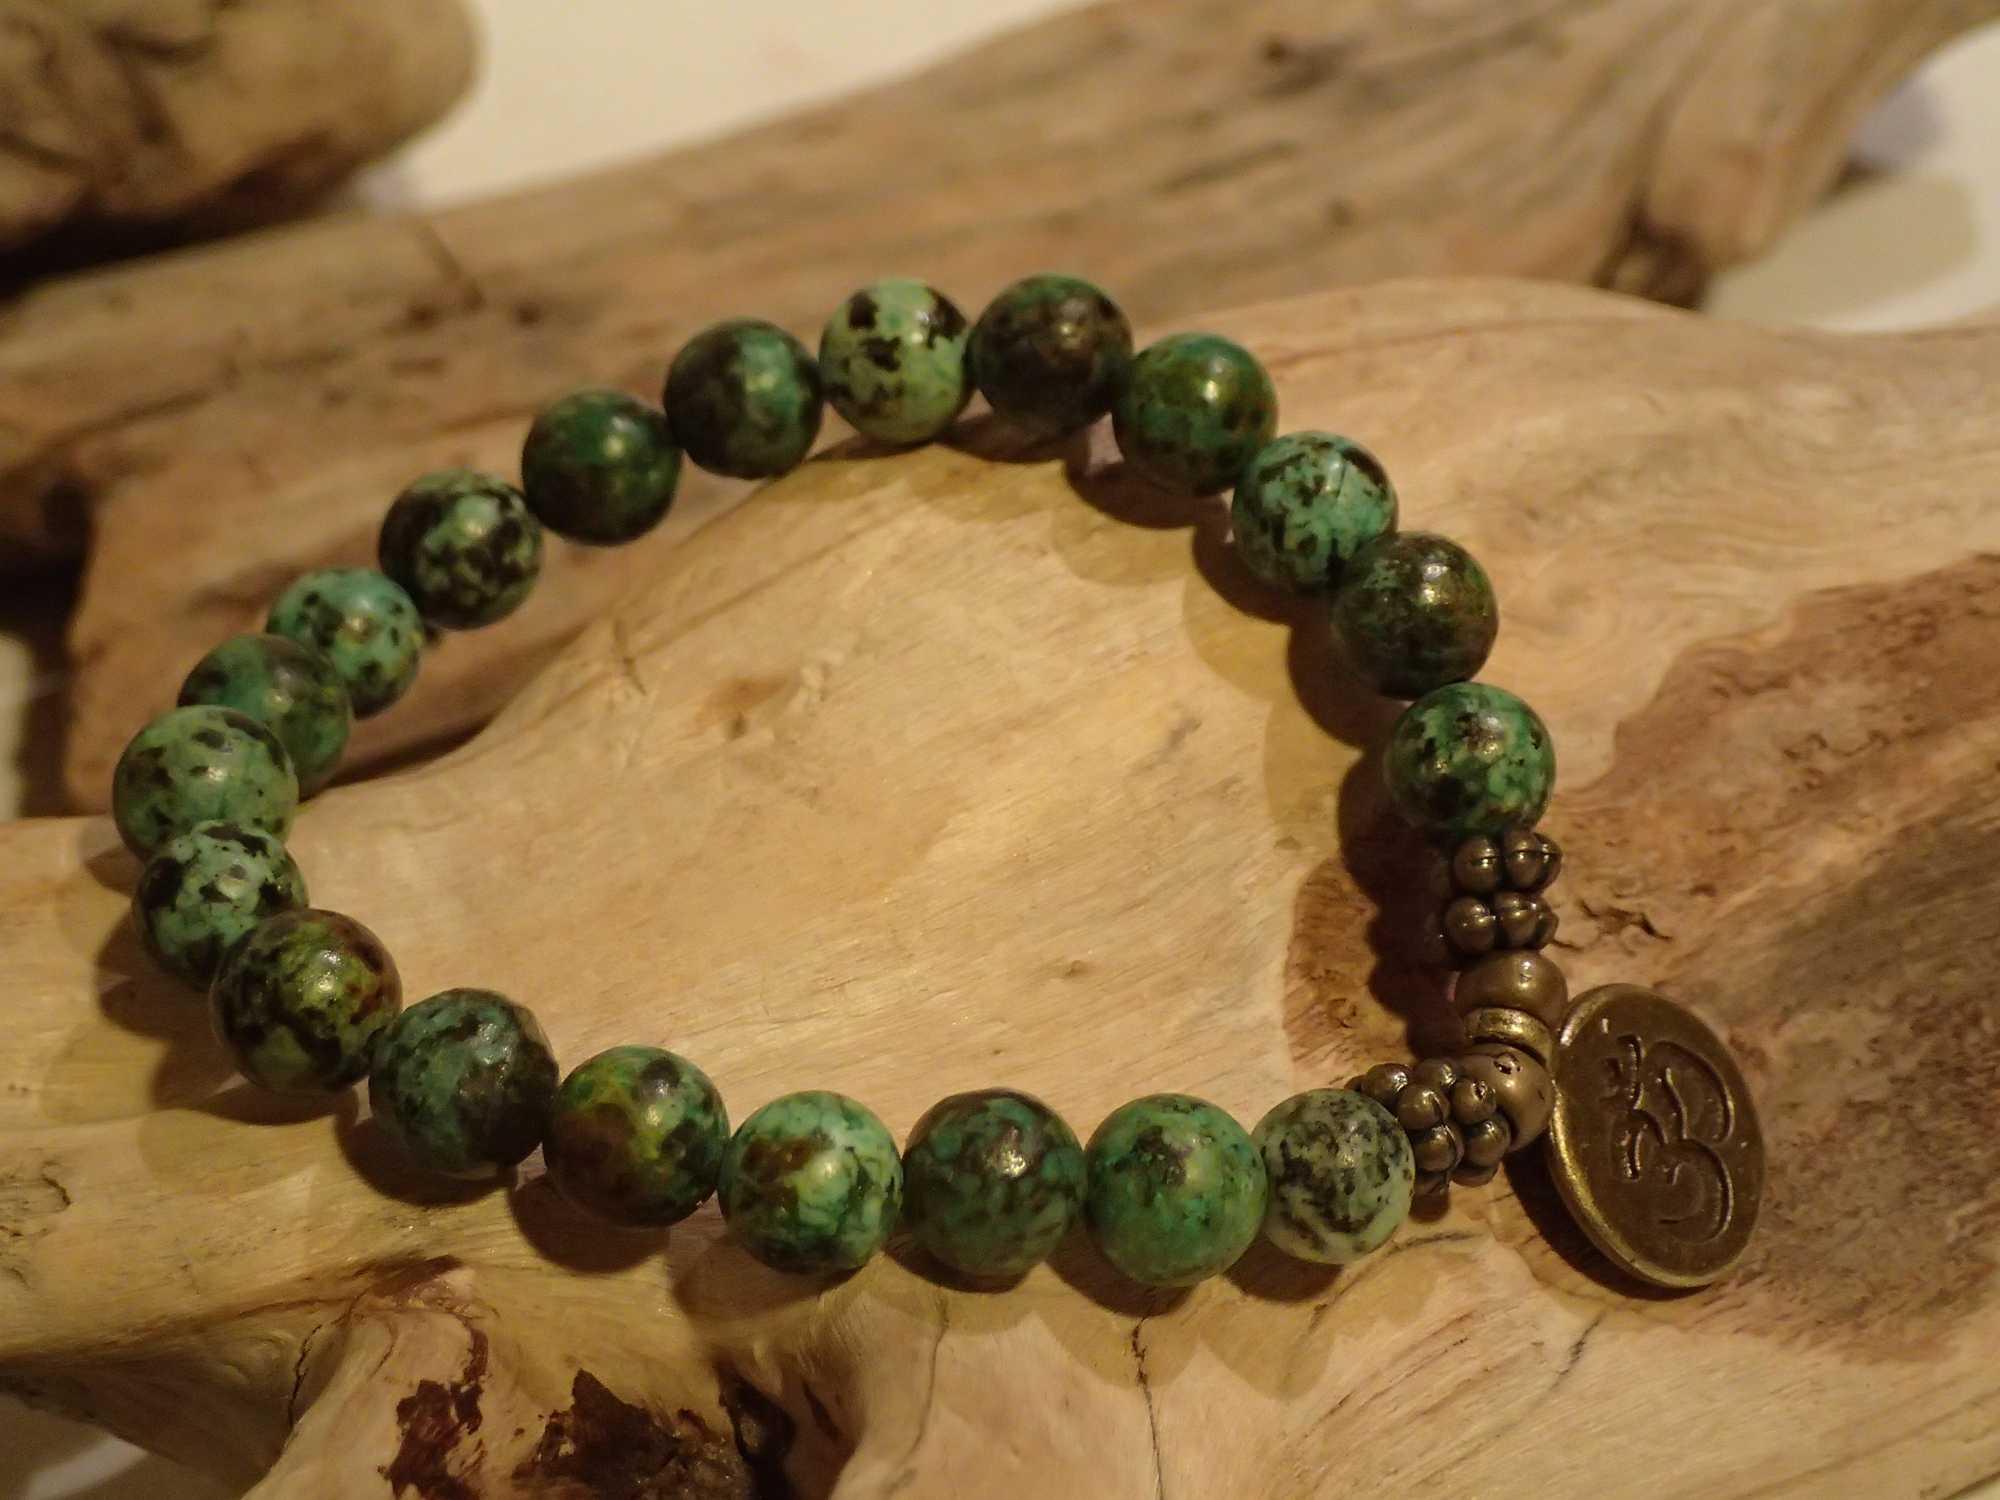 Atome-Crochu-_-product-_-bracelet-en-pierres-turquoise-dafrique-medaille-om-cuivree-03